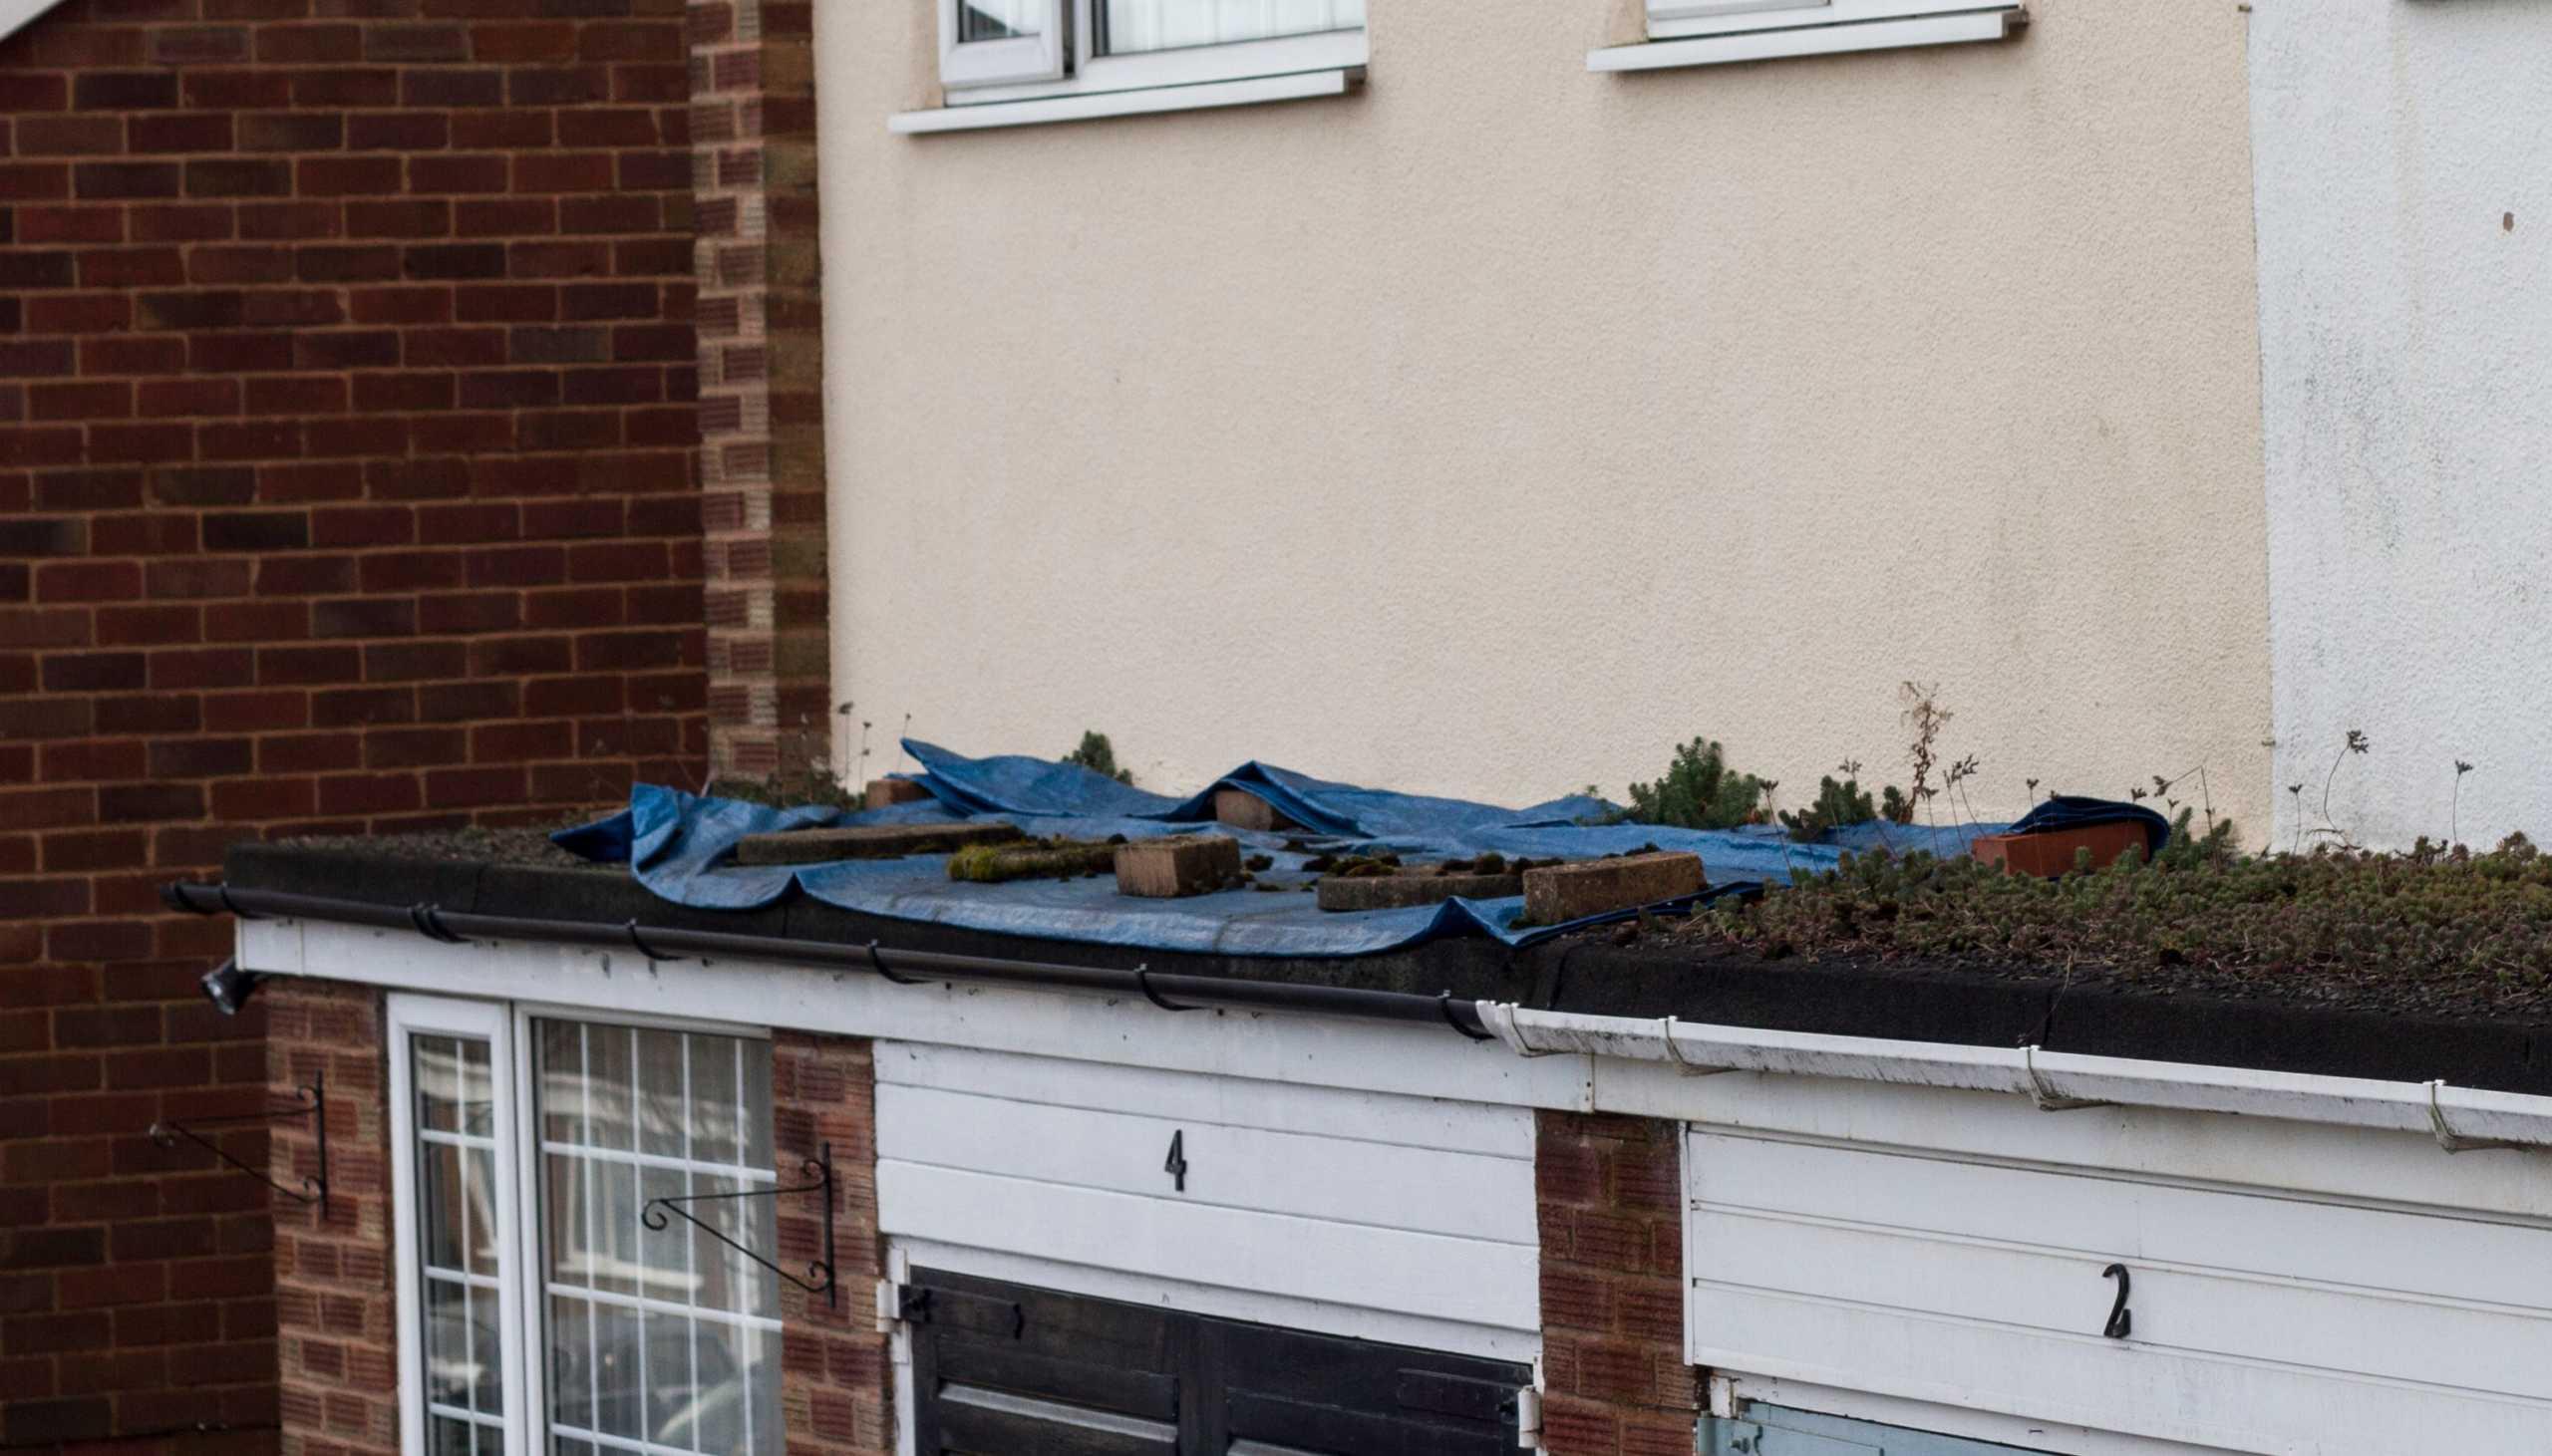 Flat roof leak repair and flat roof leak costs in Winston-Salem NC